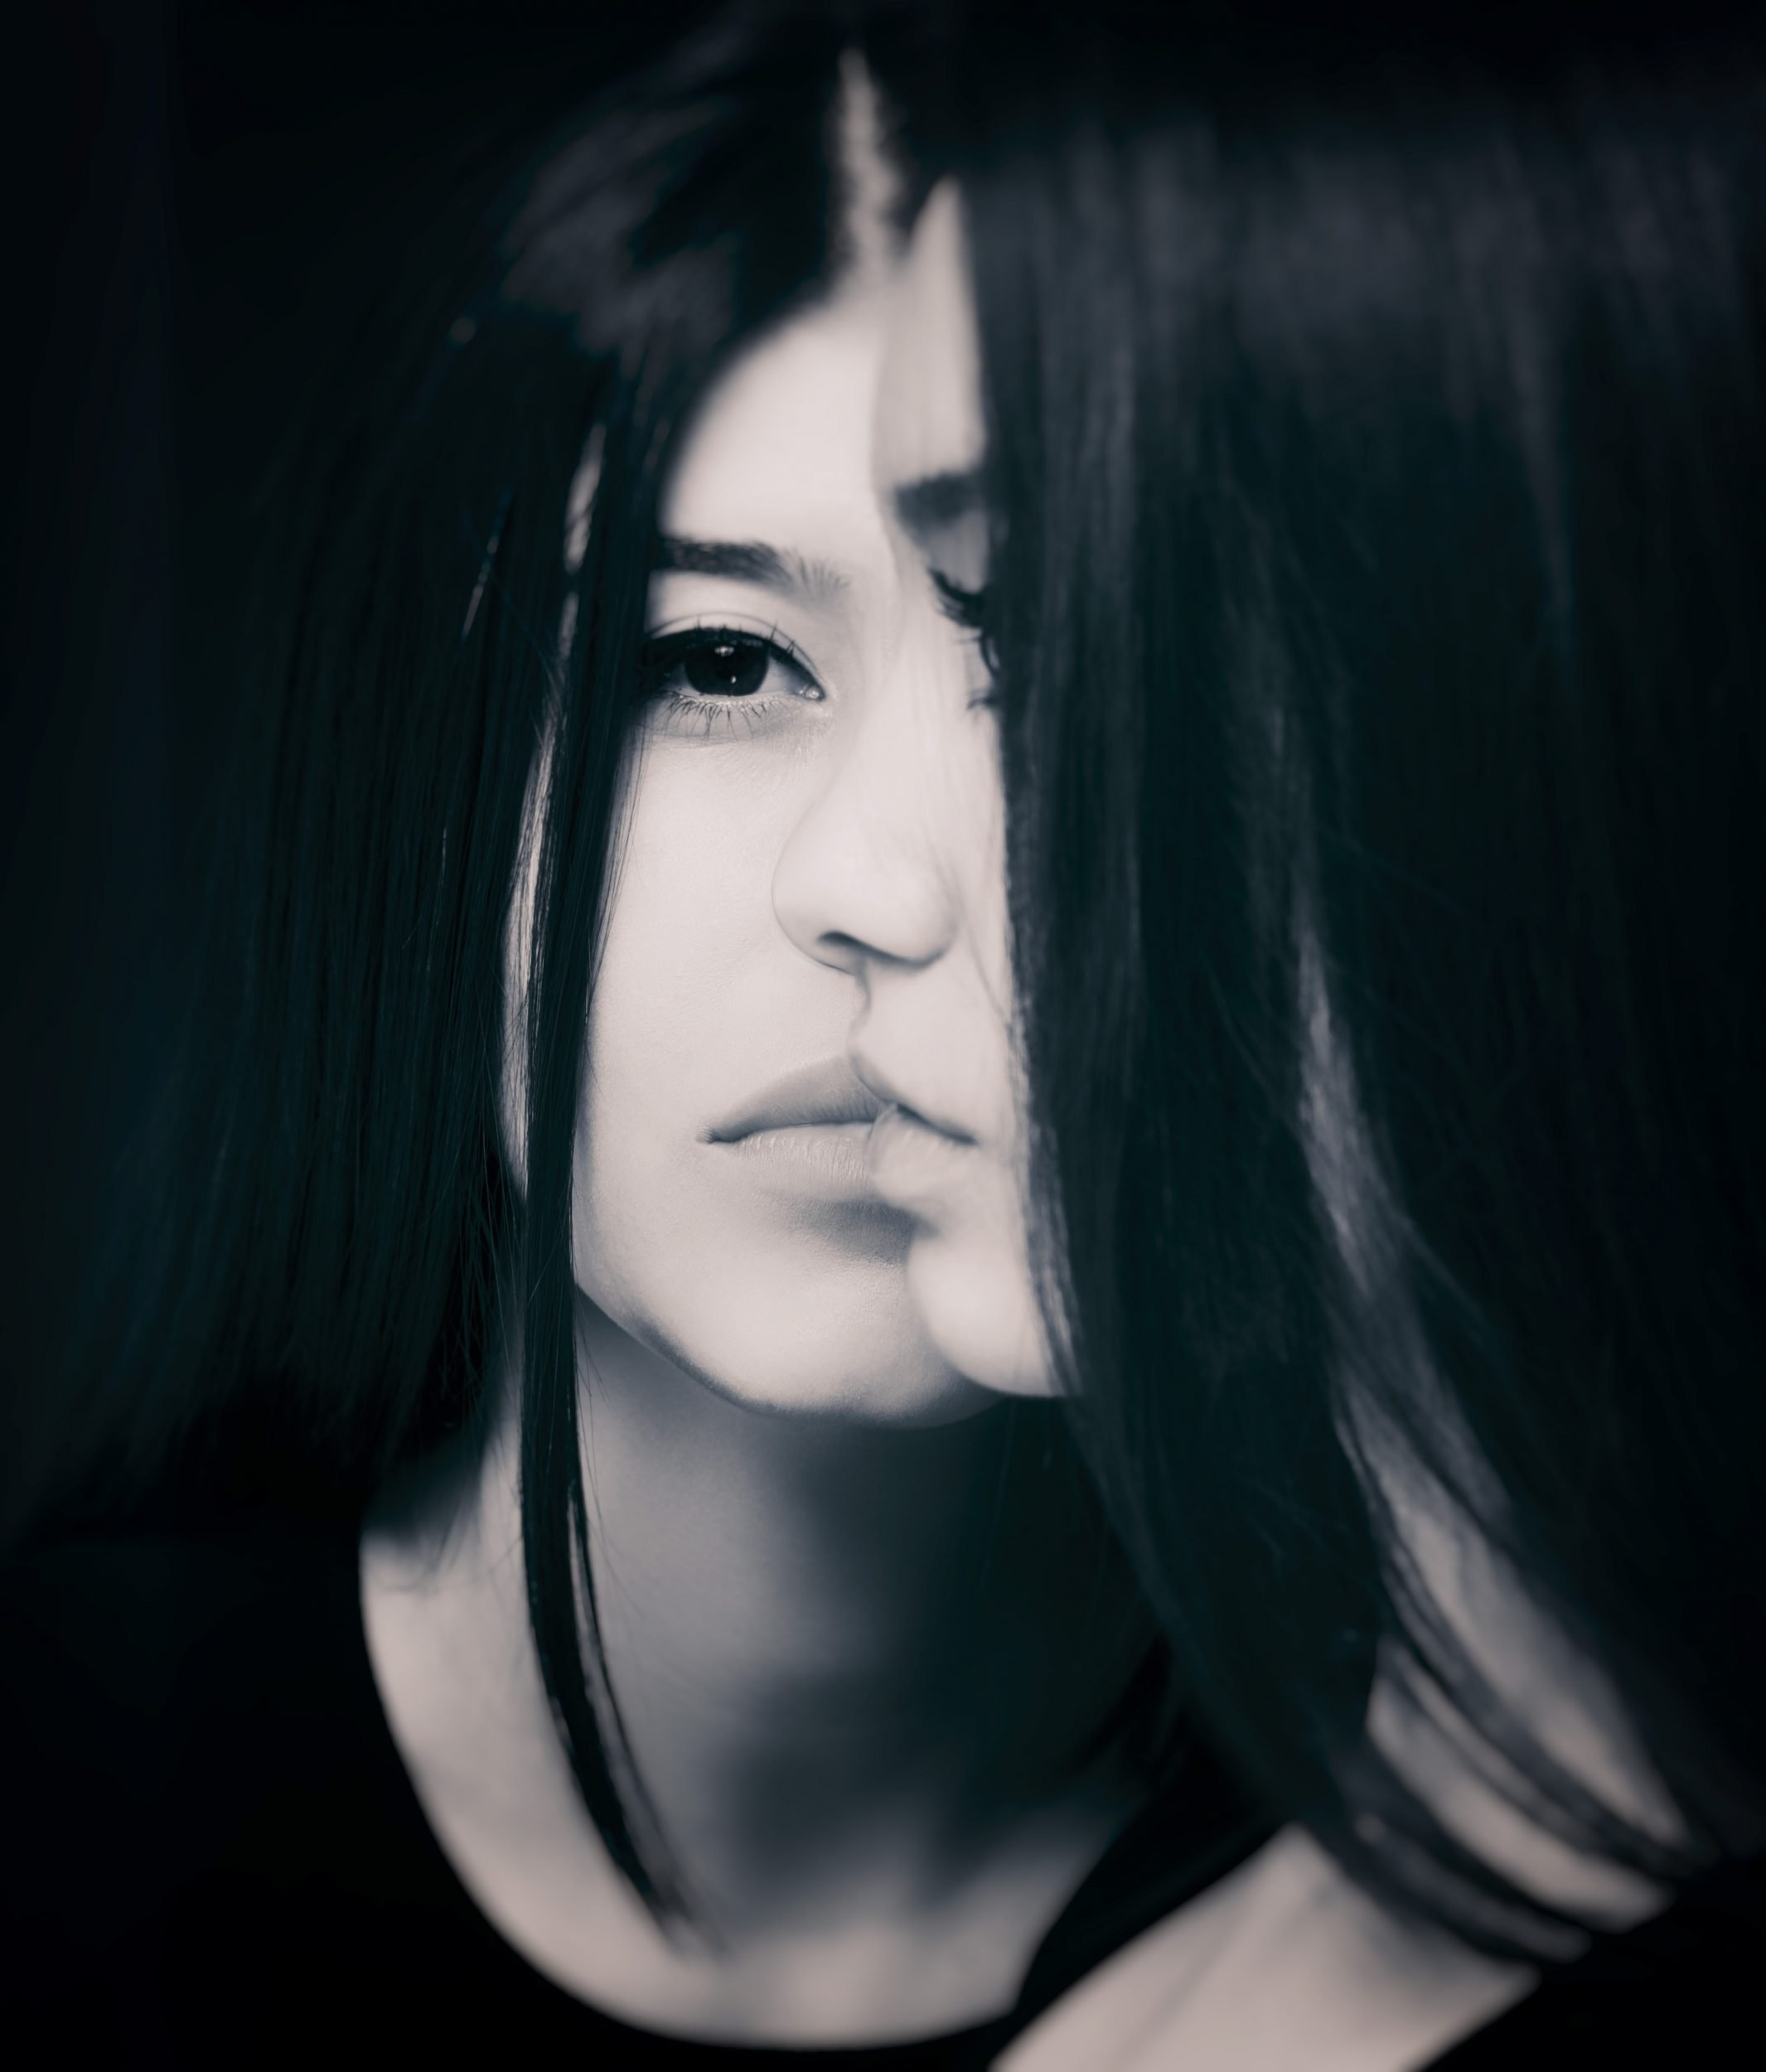 http://vdarkphoto.com/